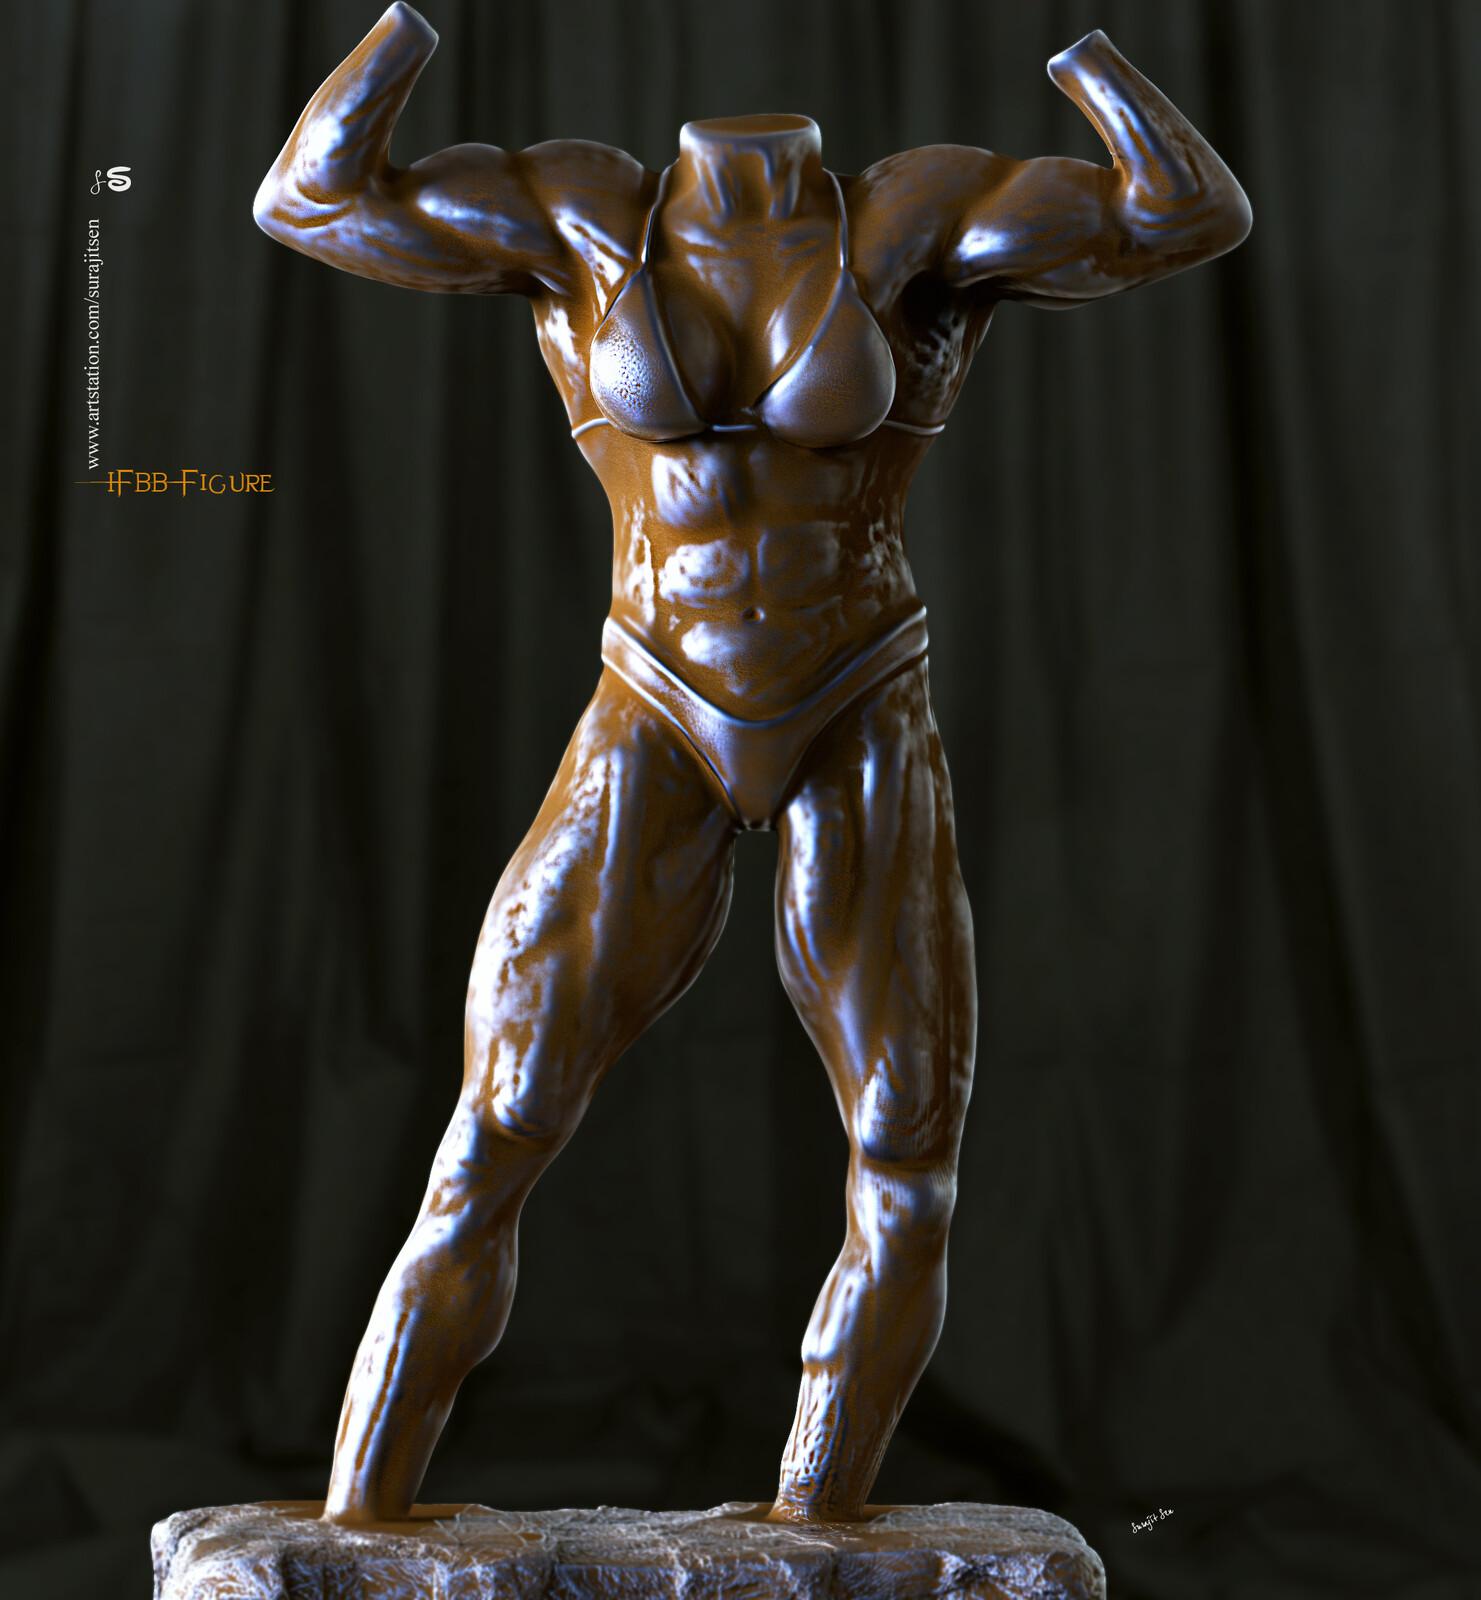 One of my study----IFBB figure digital Sculpting. Study reference-IFBB Figure of #MargitaZamolova